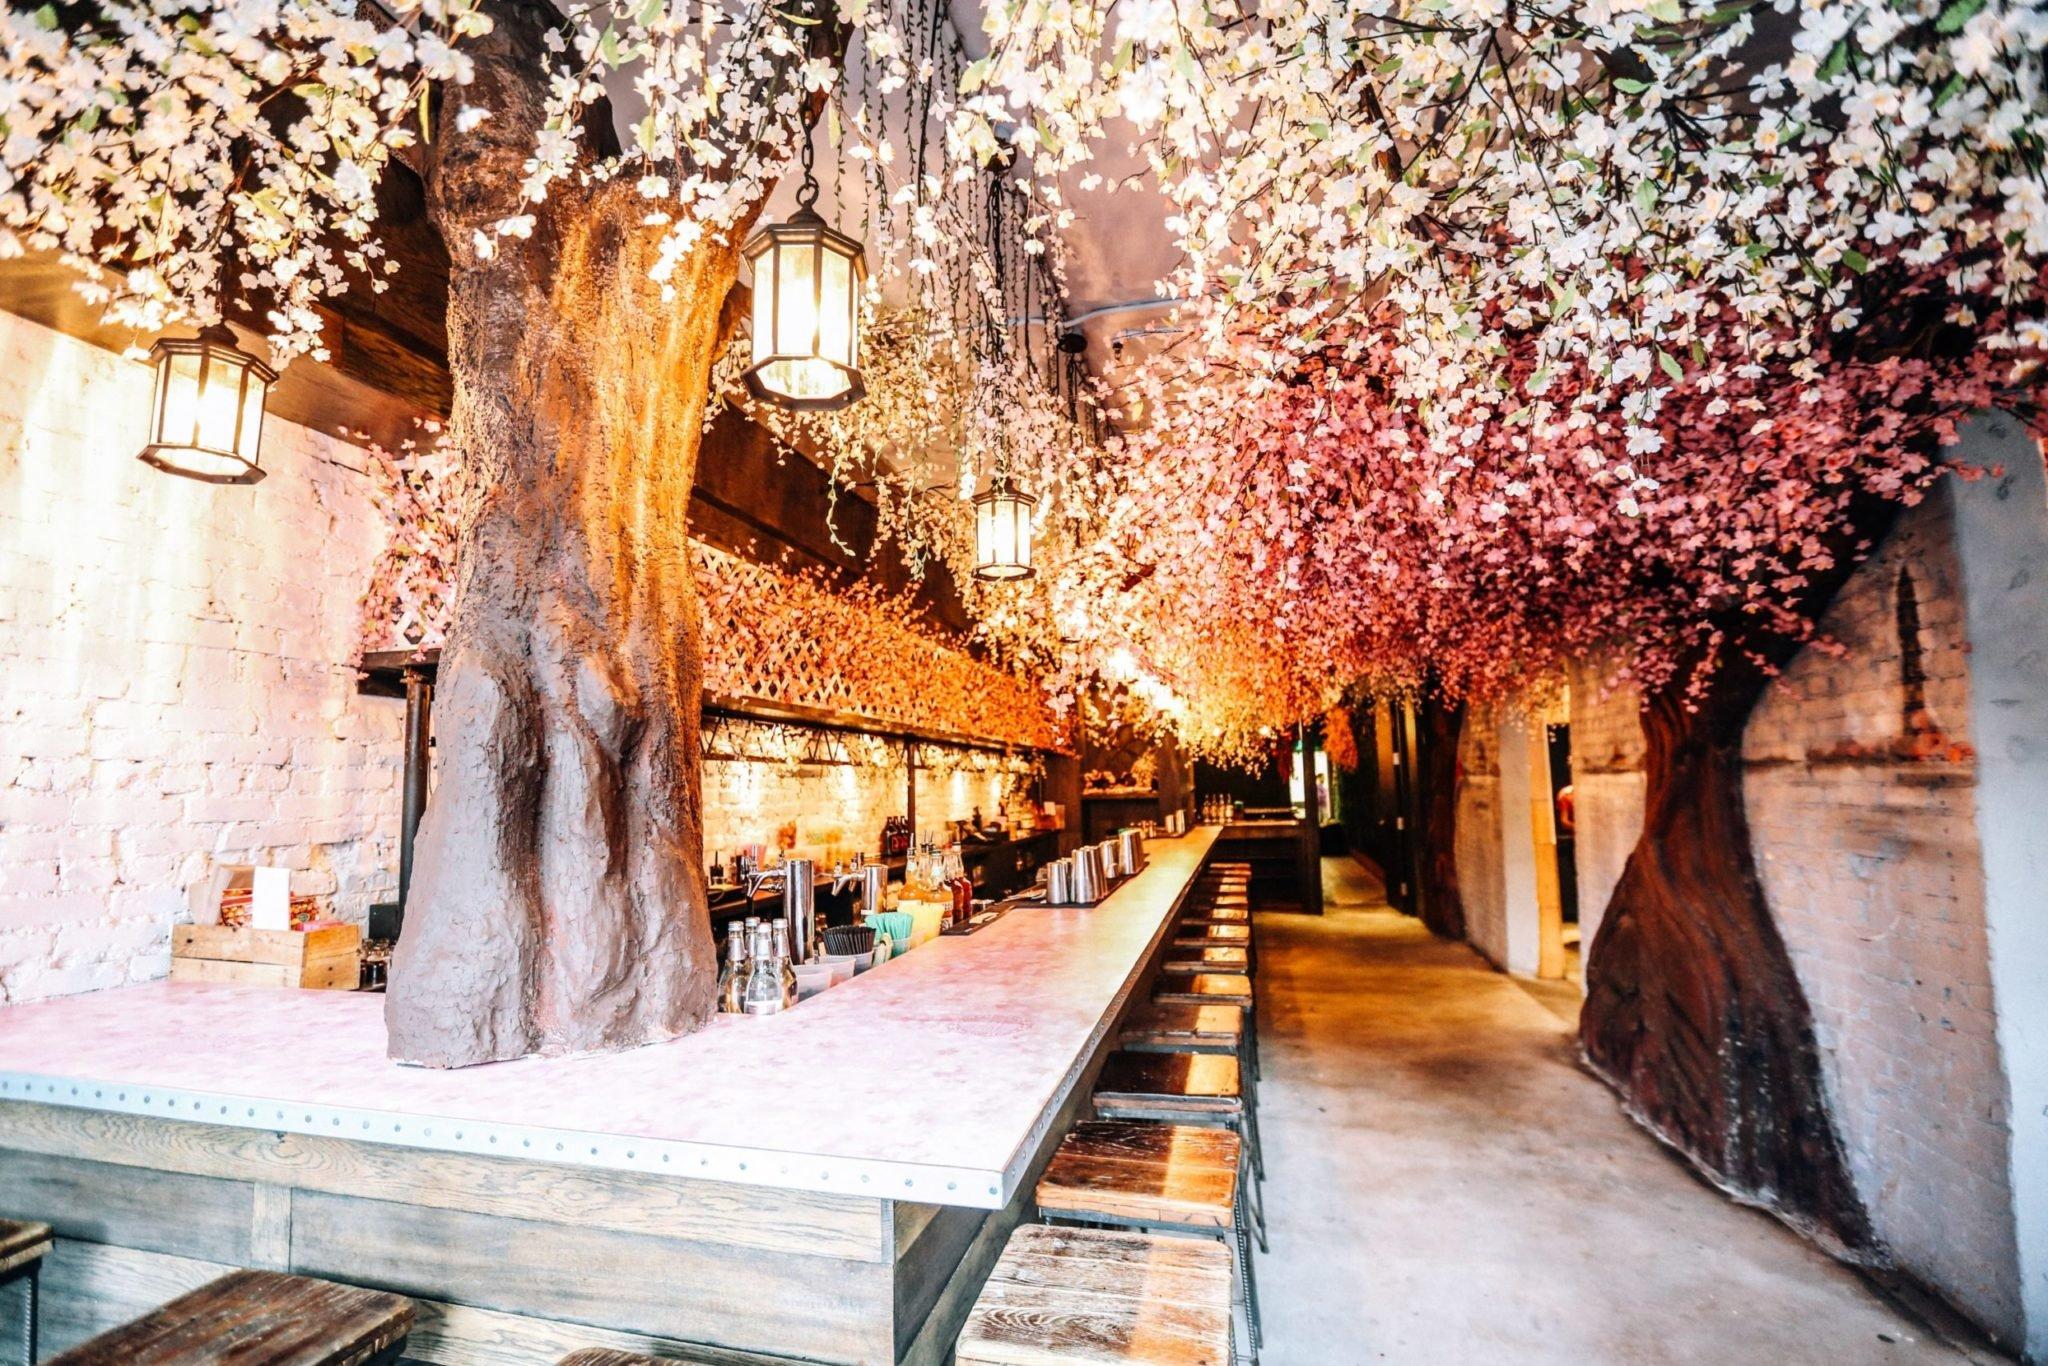 Cherry Blossom Pop Up Bar, Drink Company, cherry blossoms, Godzilla